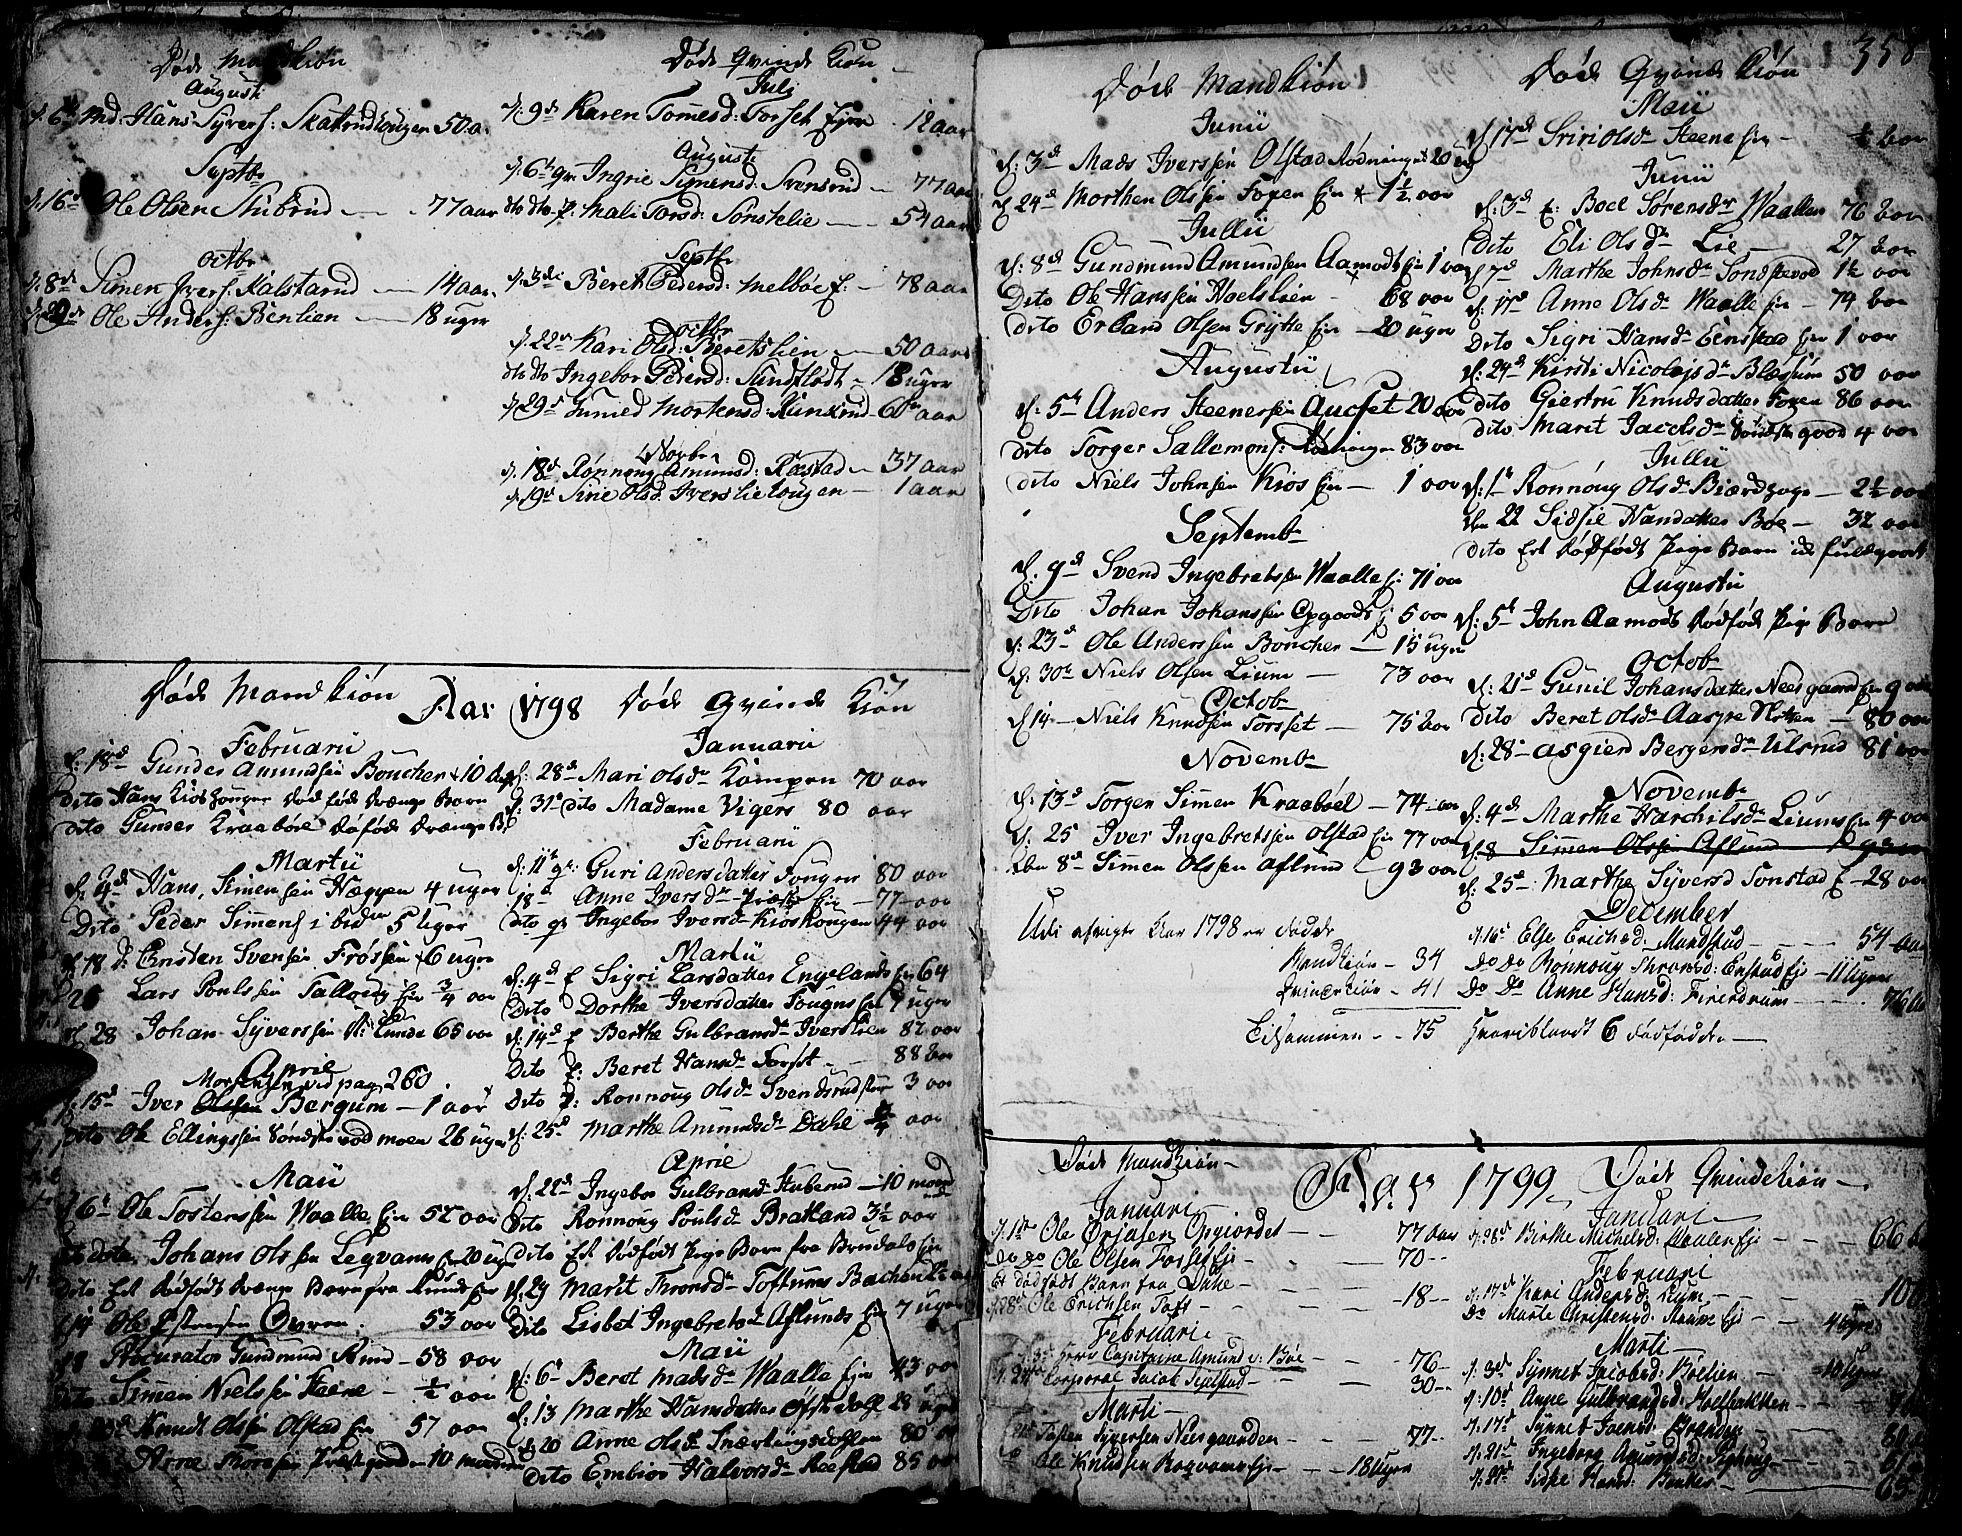 SAH, Gausdal prestekontor, Ministerialbok nr. 3, 1758-1809, s. 358